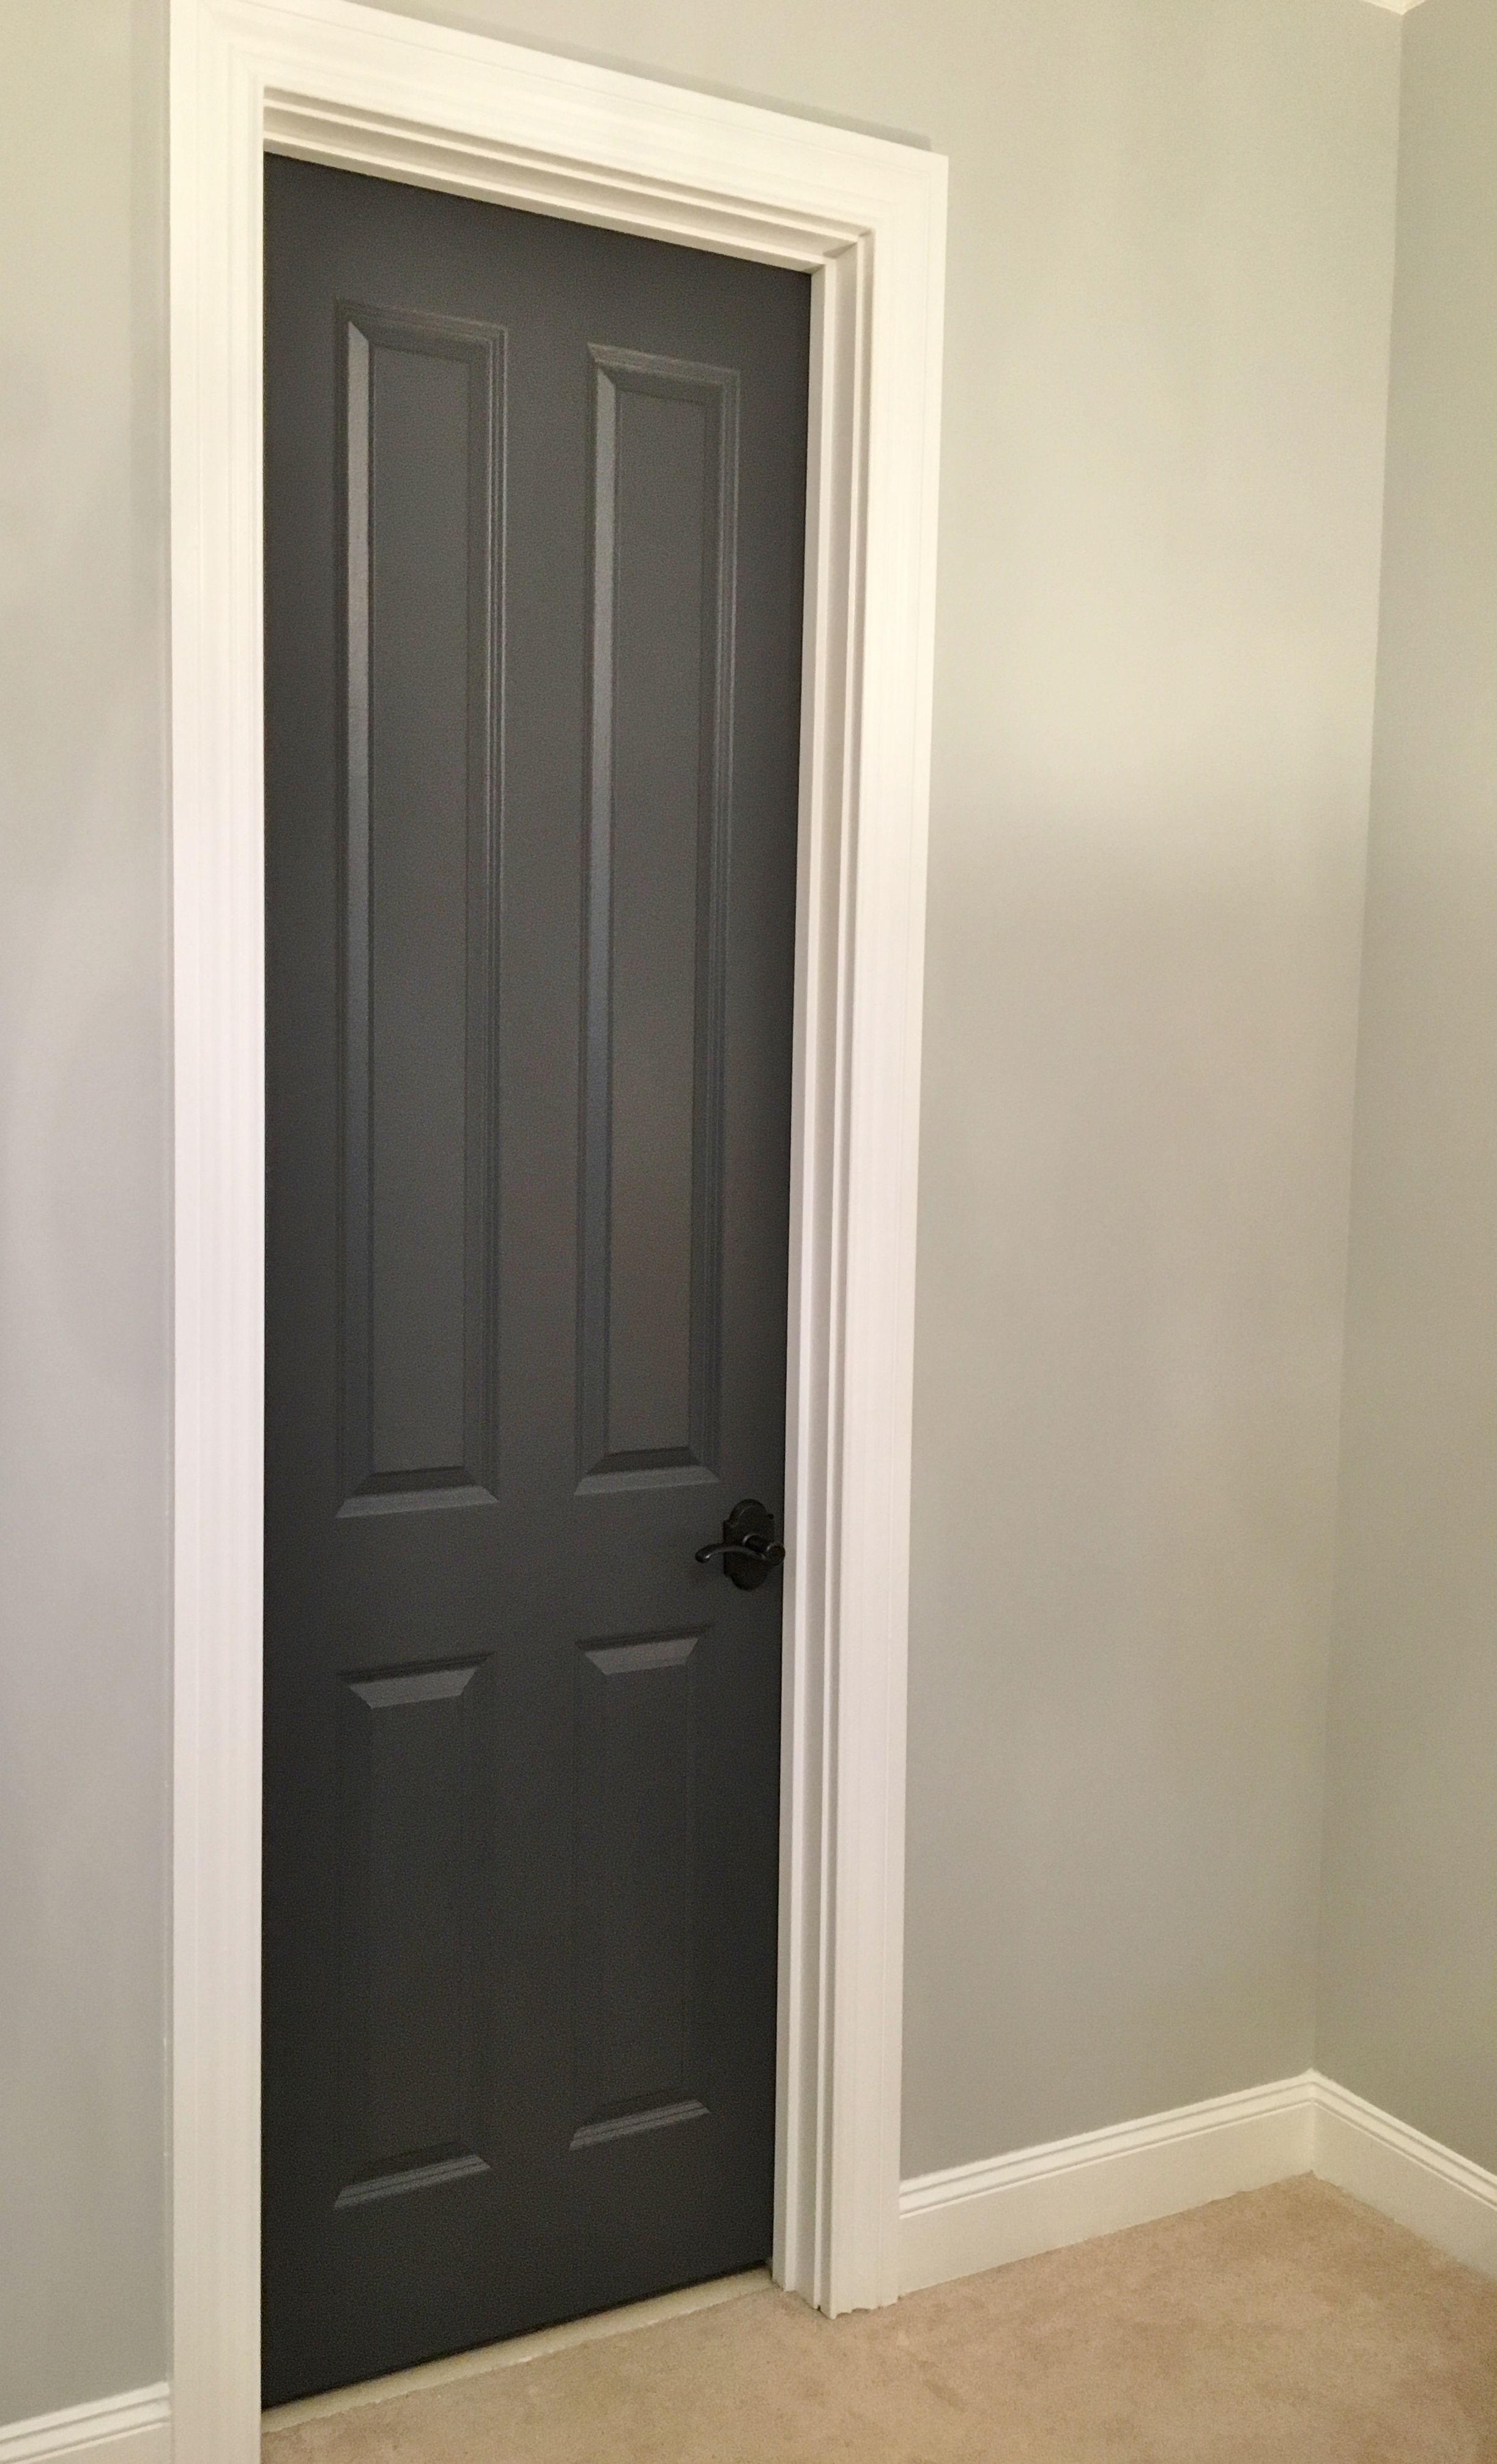 Wall Color Bm Stonington Gray Door Color Bm Wrought Iron Interior Door Colors Grey Interior Doors Painted Interior Doors